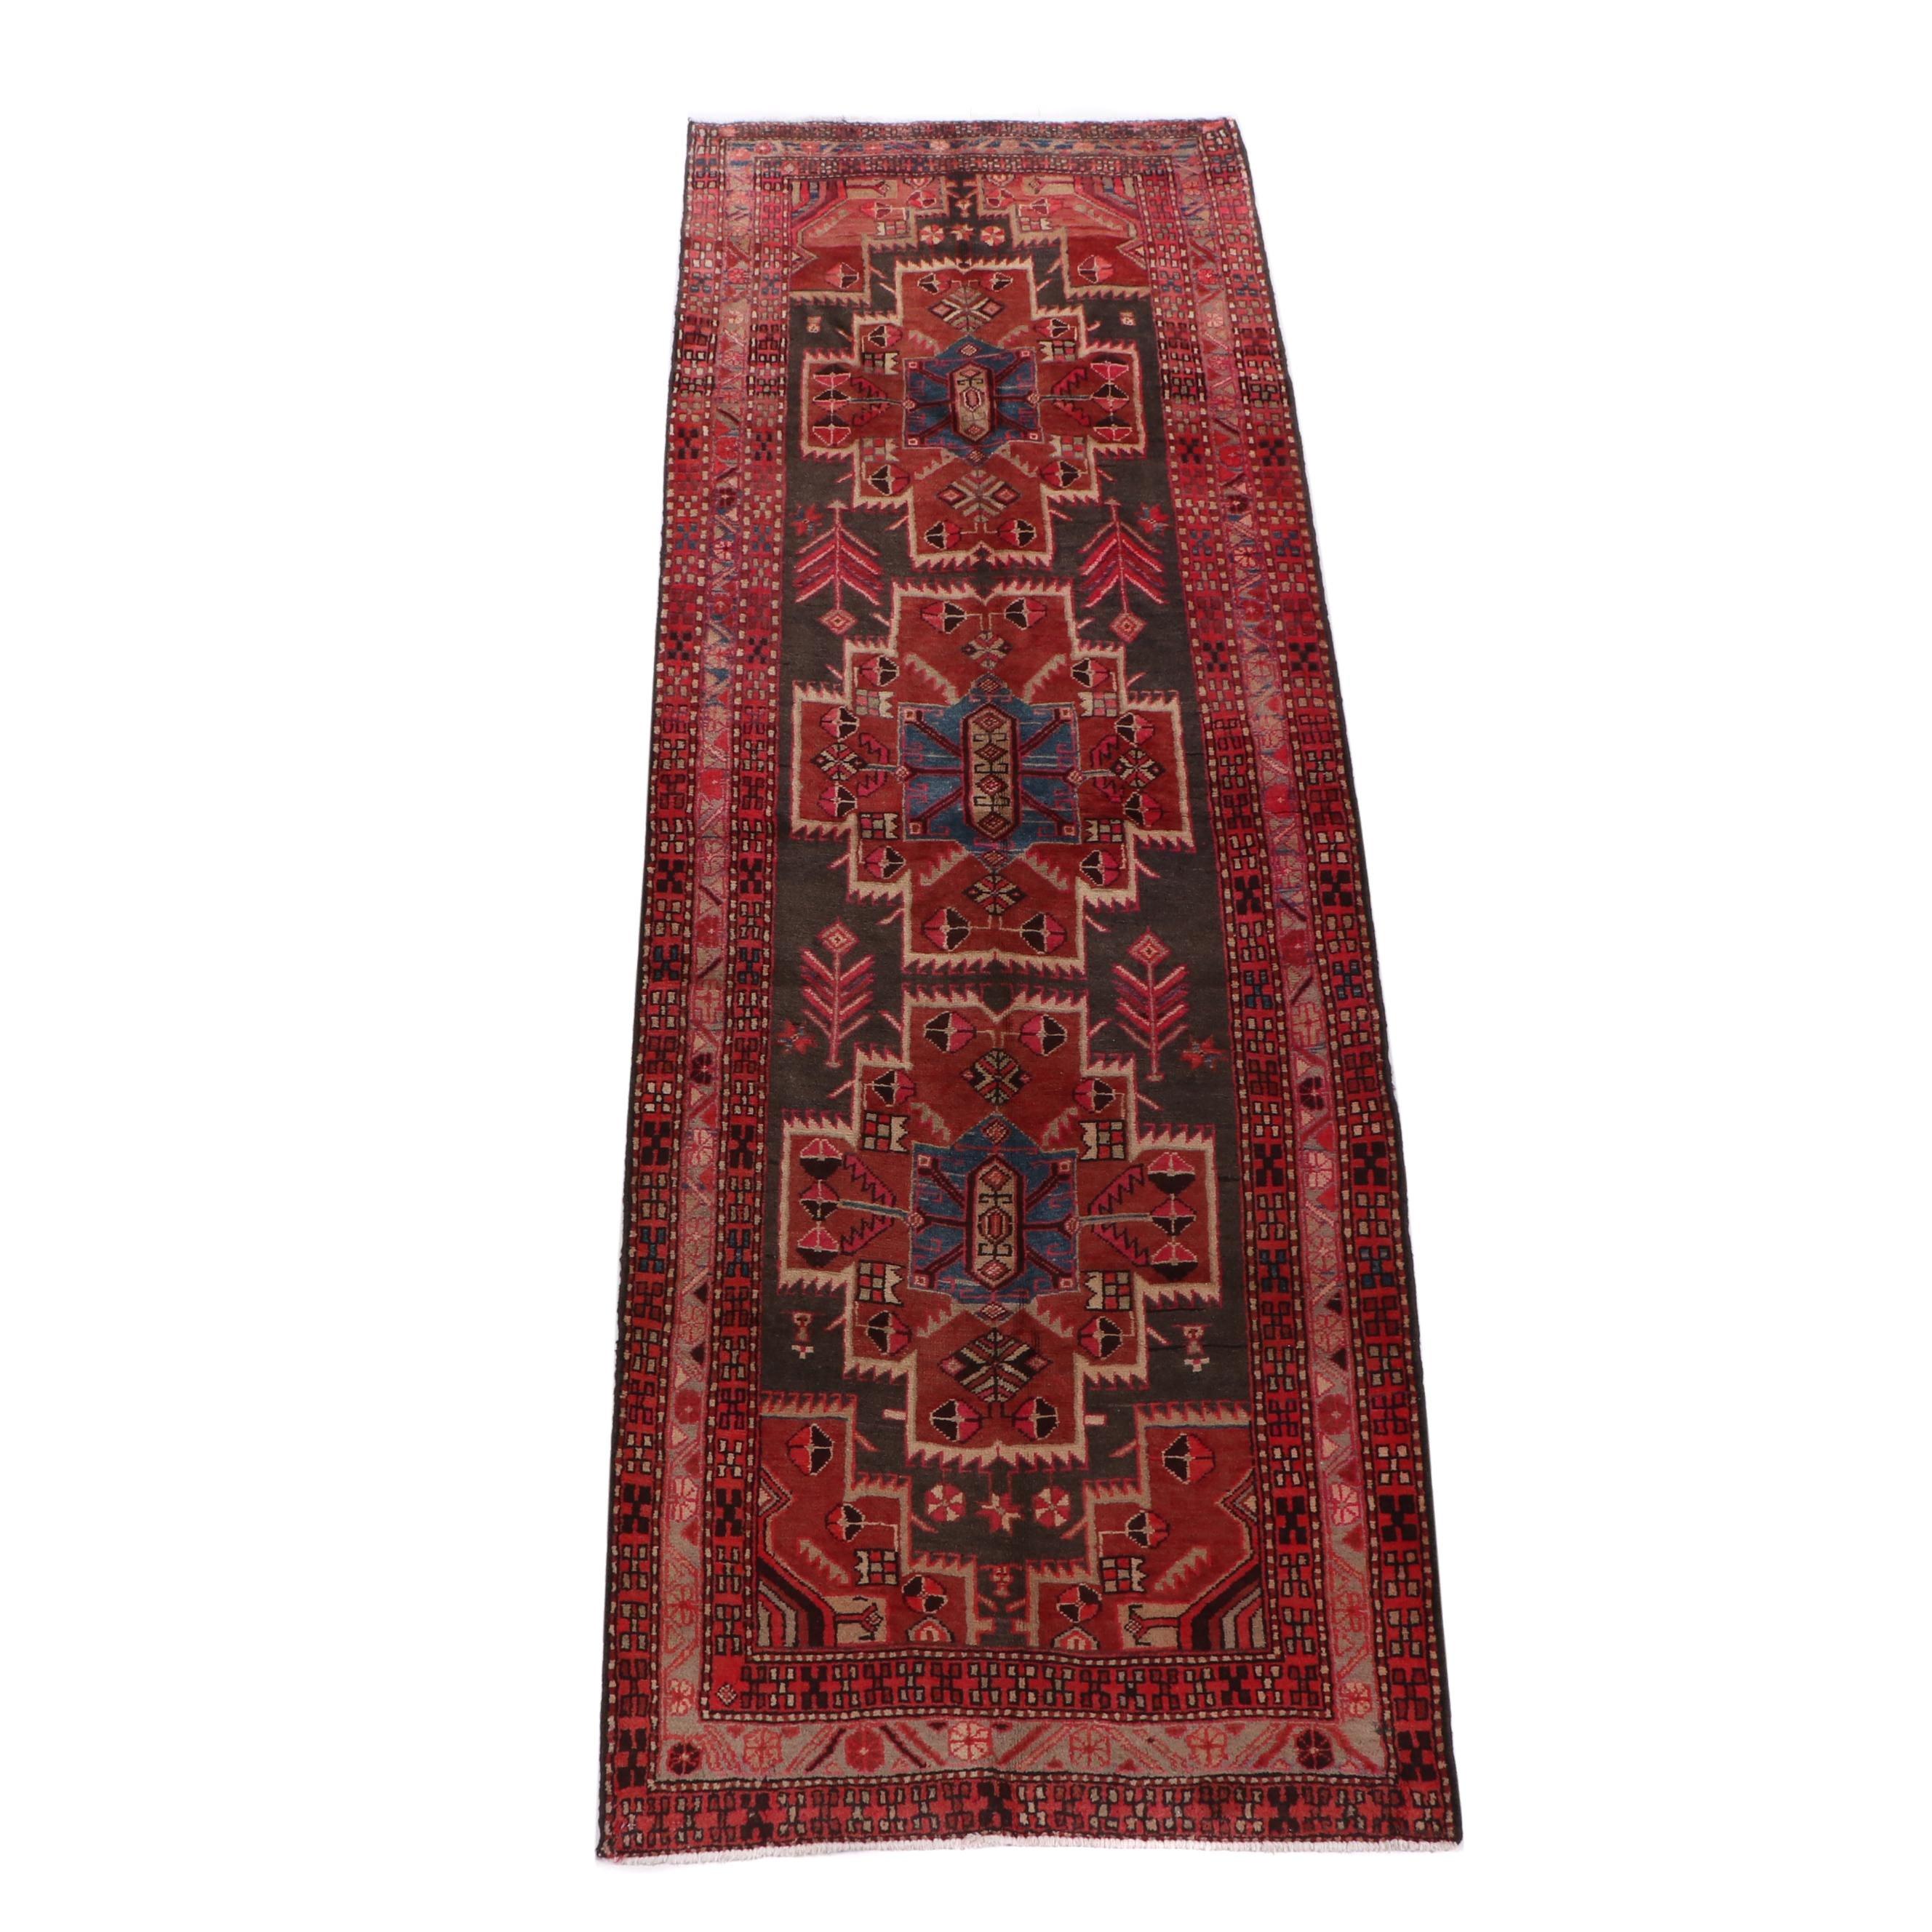 Hand-Knotted Afshar Wool Carpet Runner